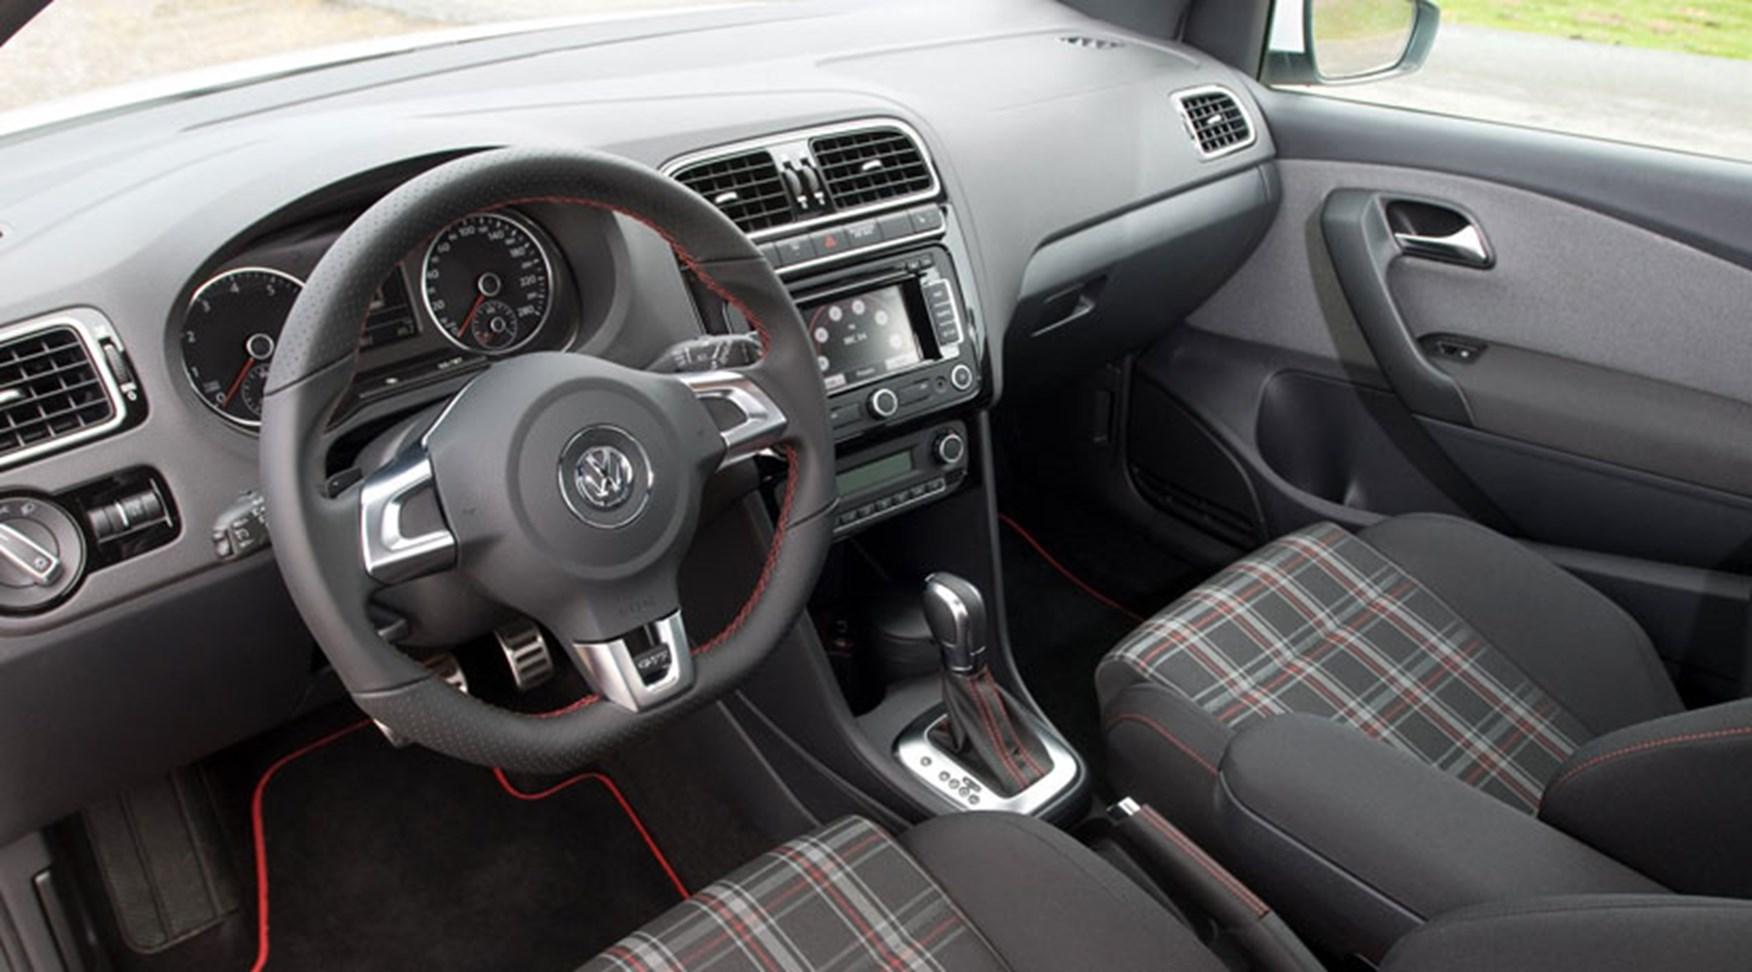 VW Polo GTI (2010) review by CAR Magazine